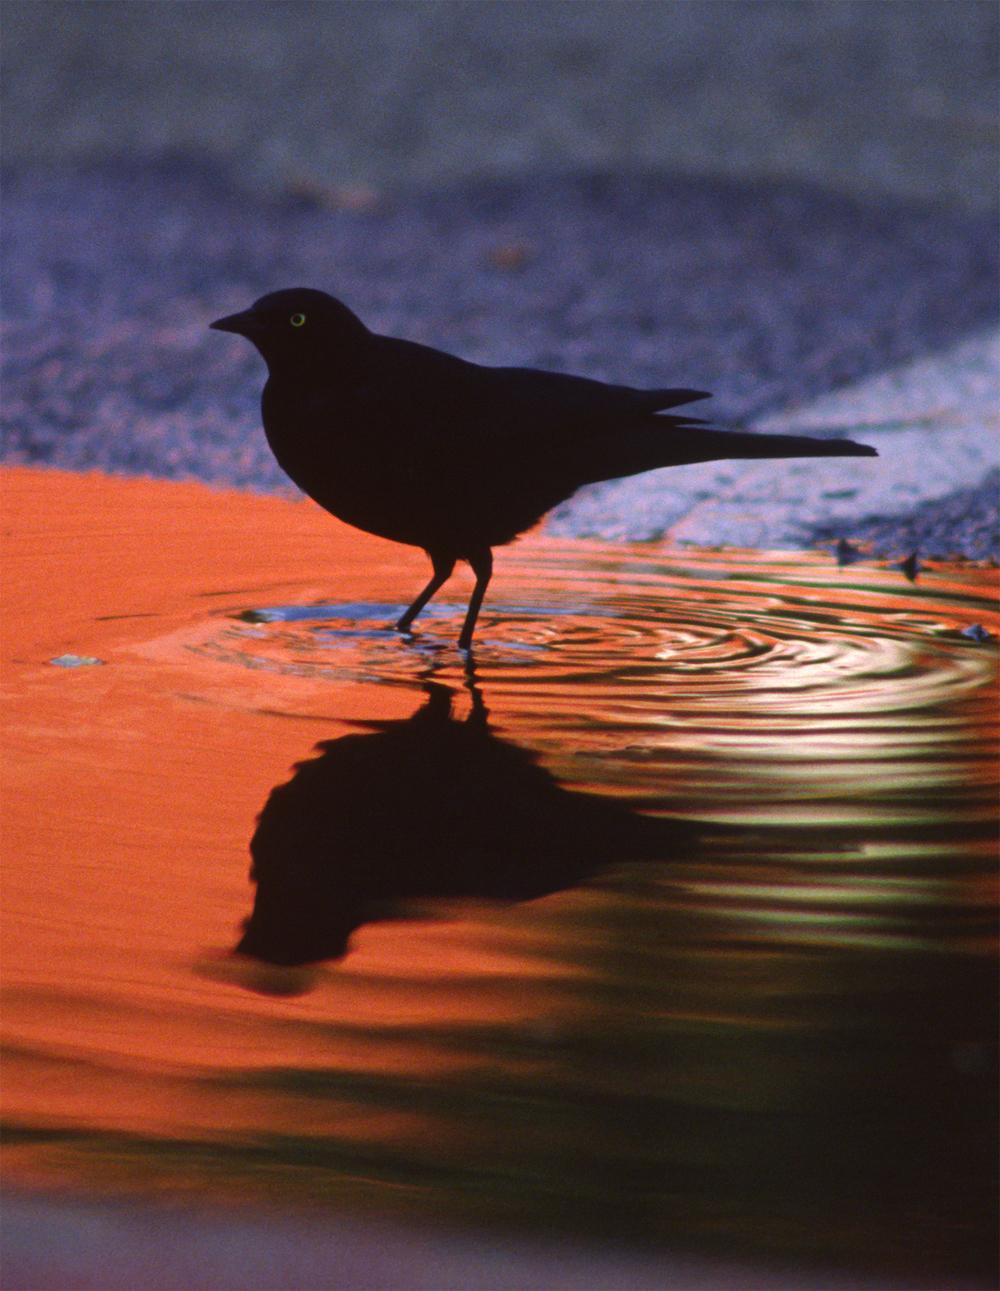 Blackbird_1500.jpg